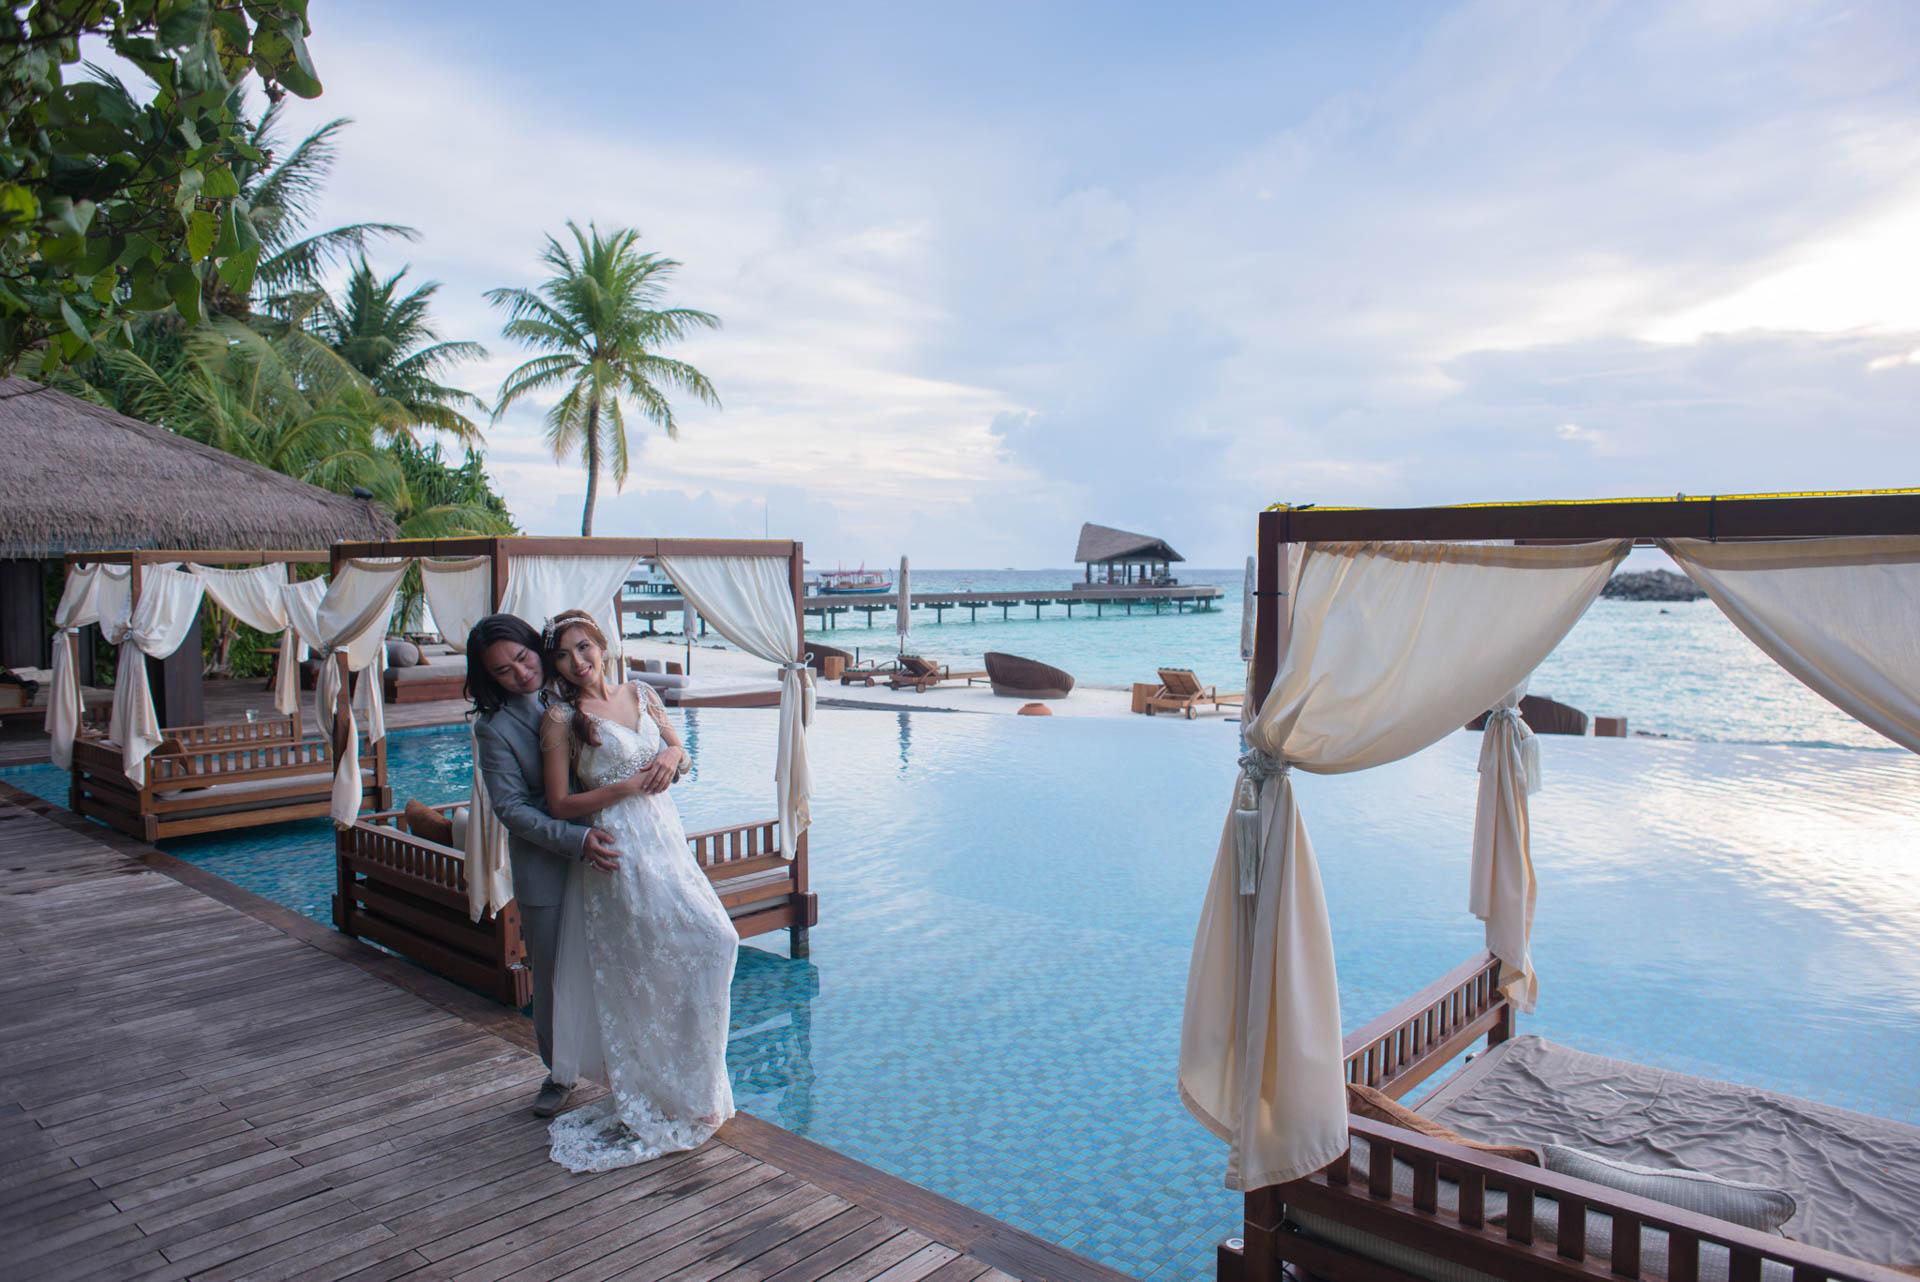 Chih Chao Yu Shan Destination Wedding at Residence Maldives 7